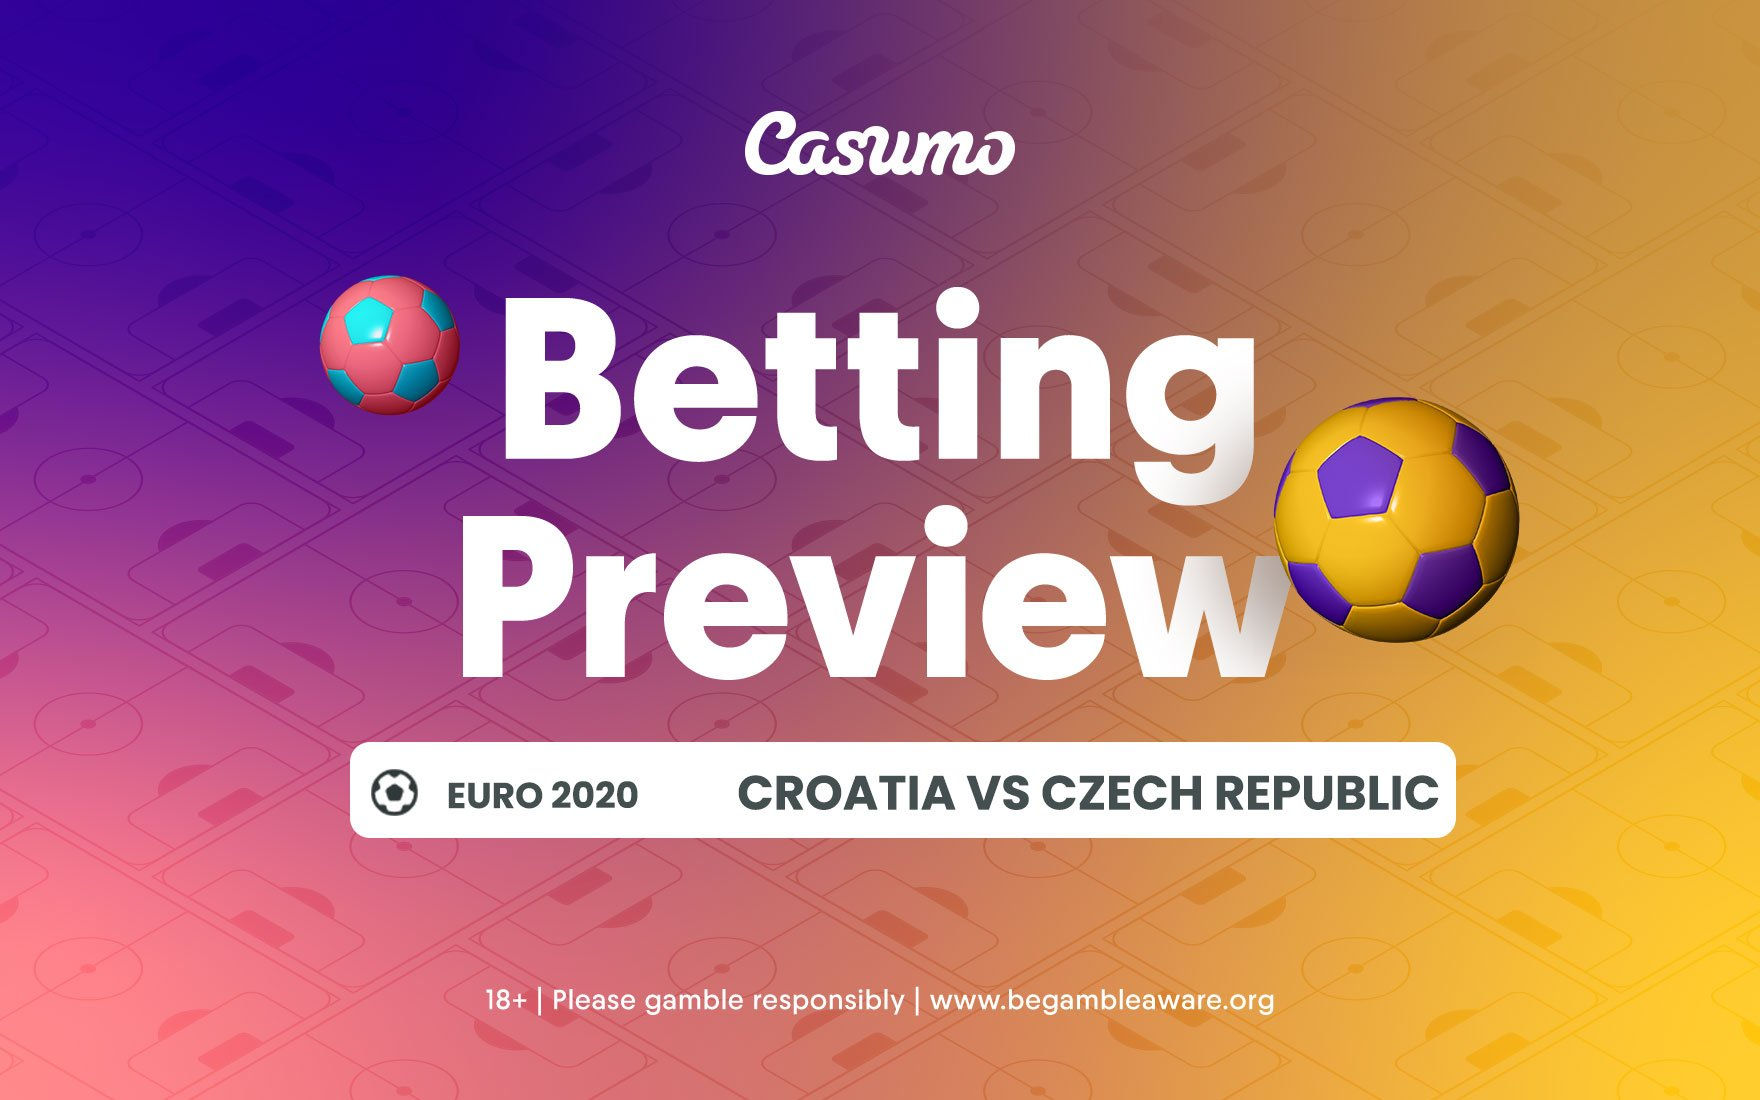 croatia vs czech republic - photo #11